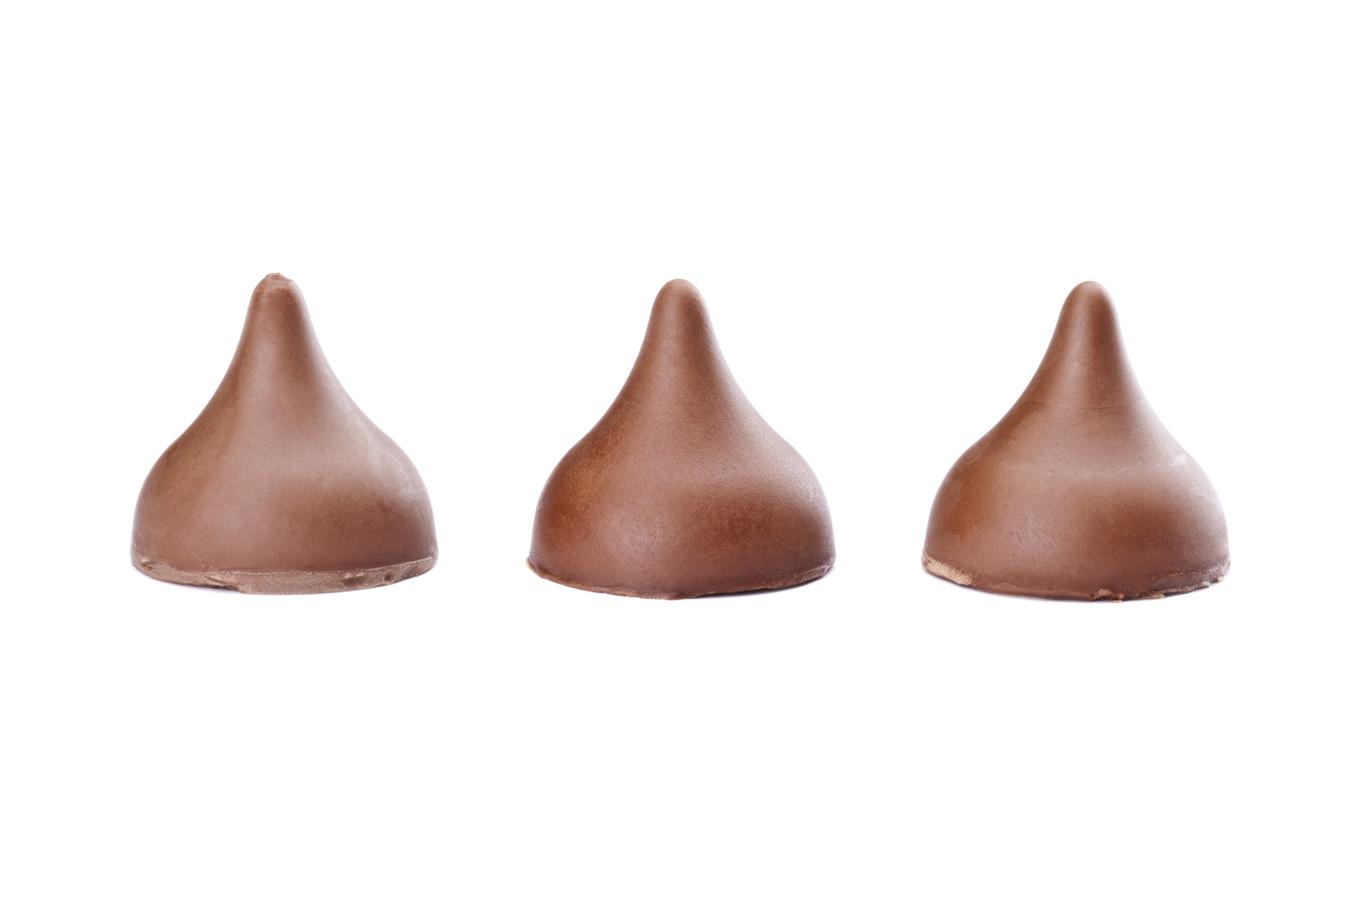 Chocolate-Kissed-1366-0221